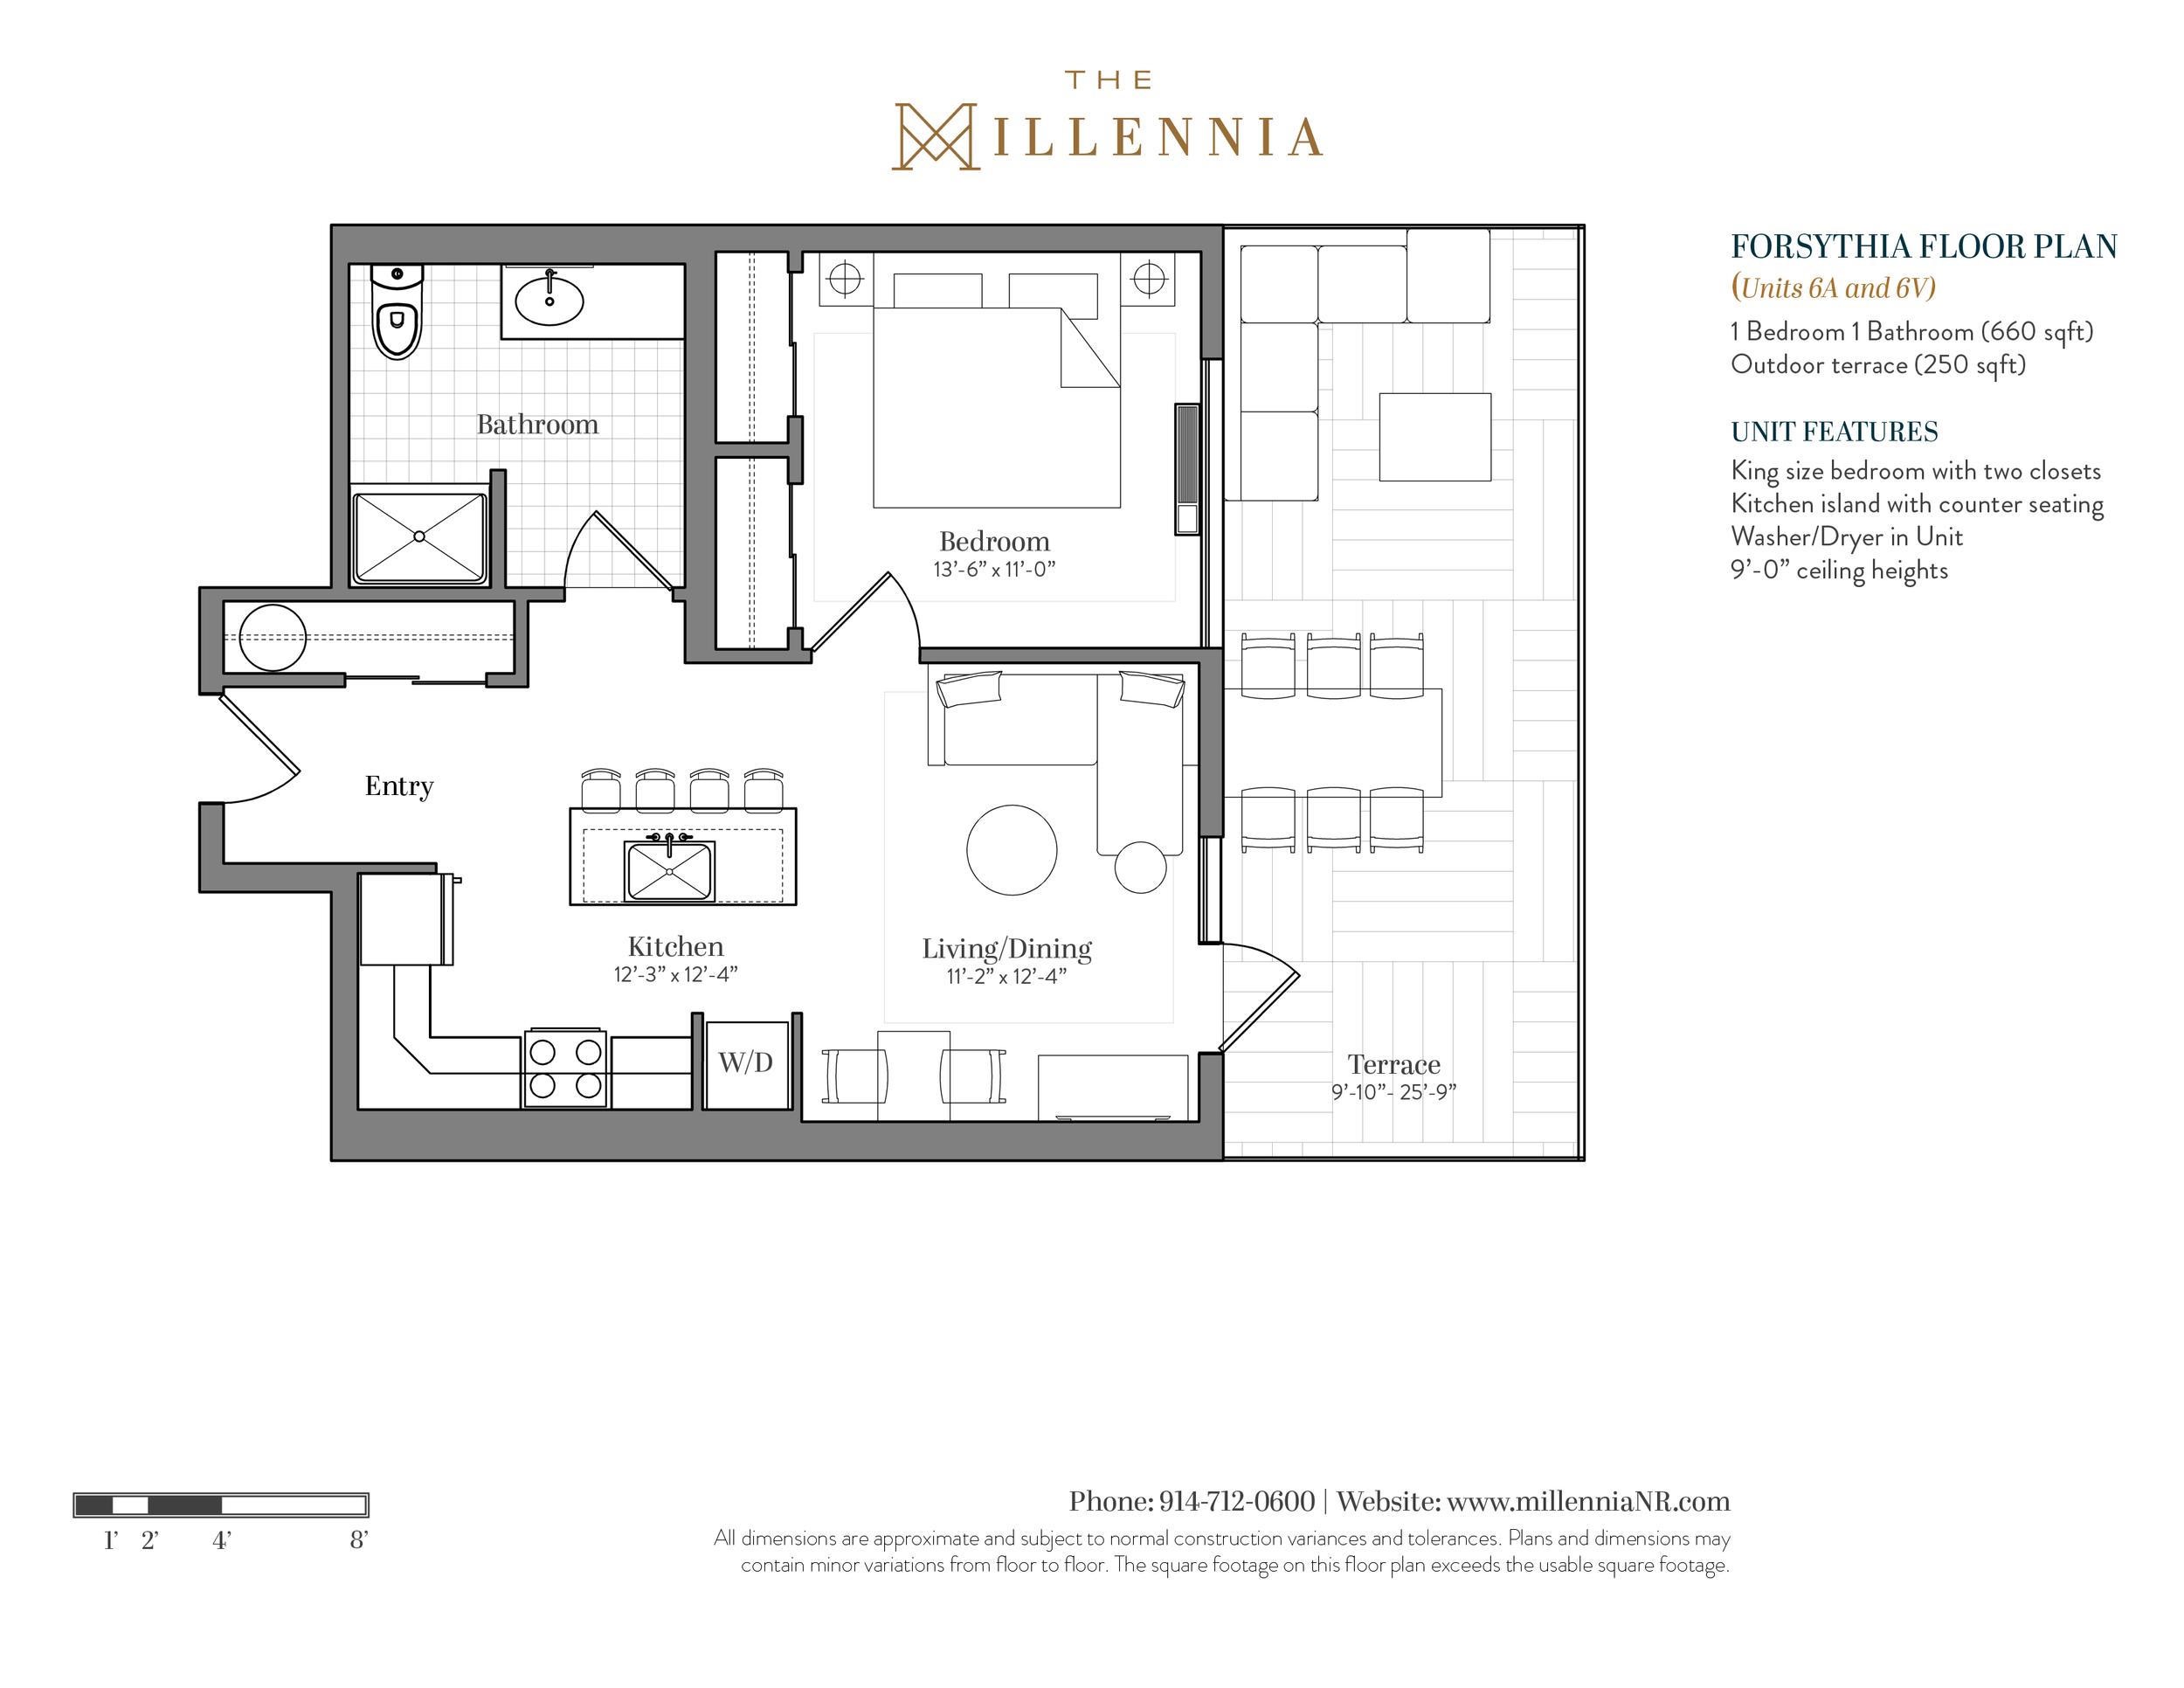 Millennia_Floorplans_Forsythia.png